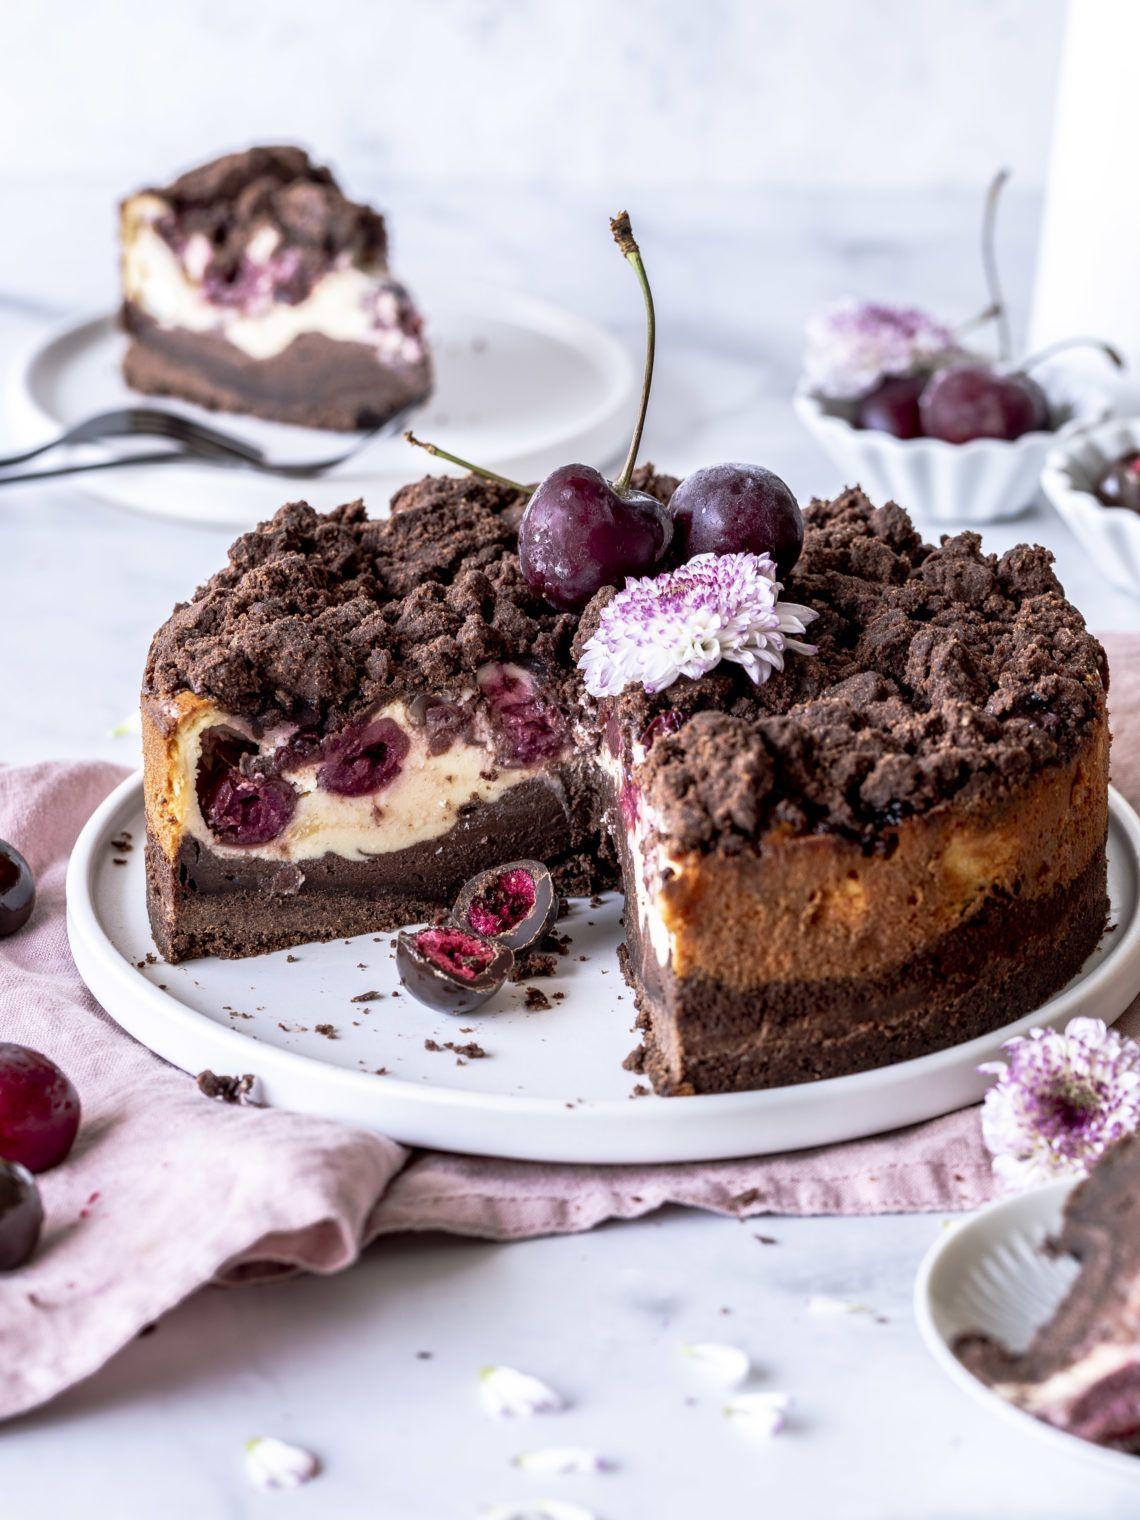 Schoko Kirsch Käsekuchen Rezept mit Streuseln einfach lecker schokoladig backen Backblog Foodblog Foodphotography Cheesecake Schokolade #cheesecake #kirschen #schokolade #backen | Emma´s Lieblingsstücke #fooddiy